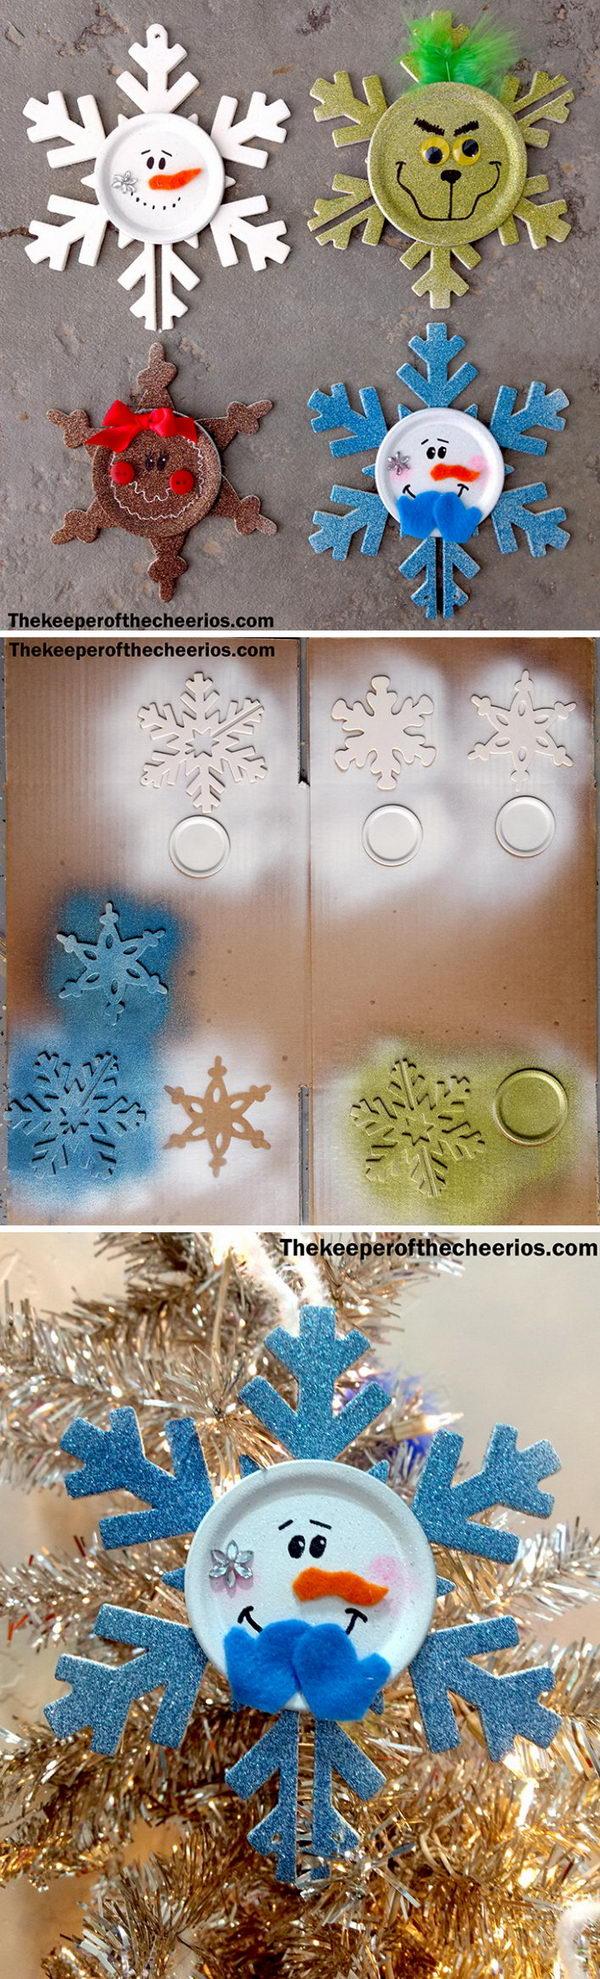 Snowflake Christmas Ornaments.